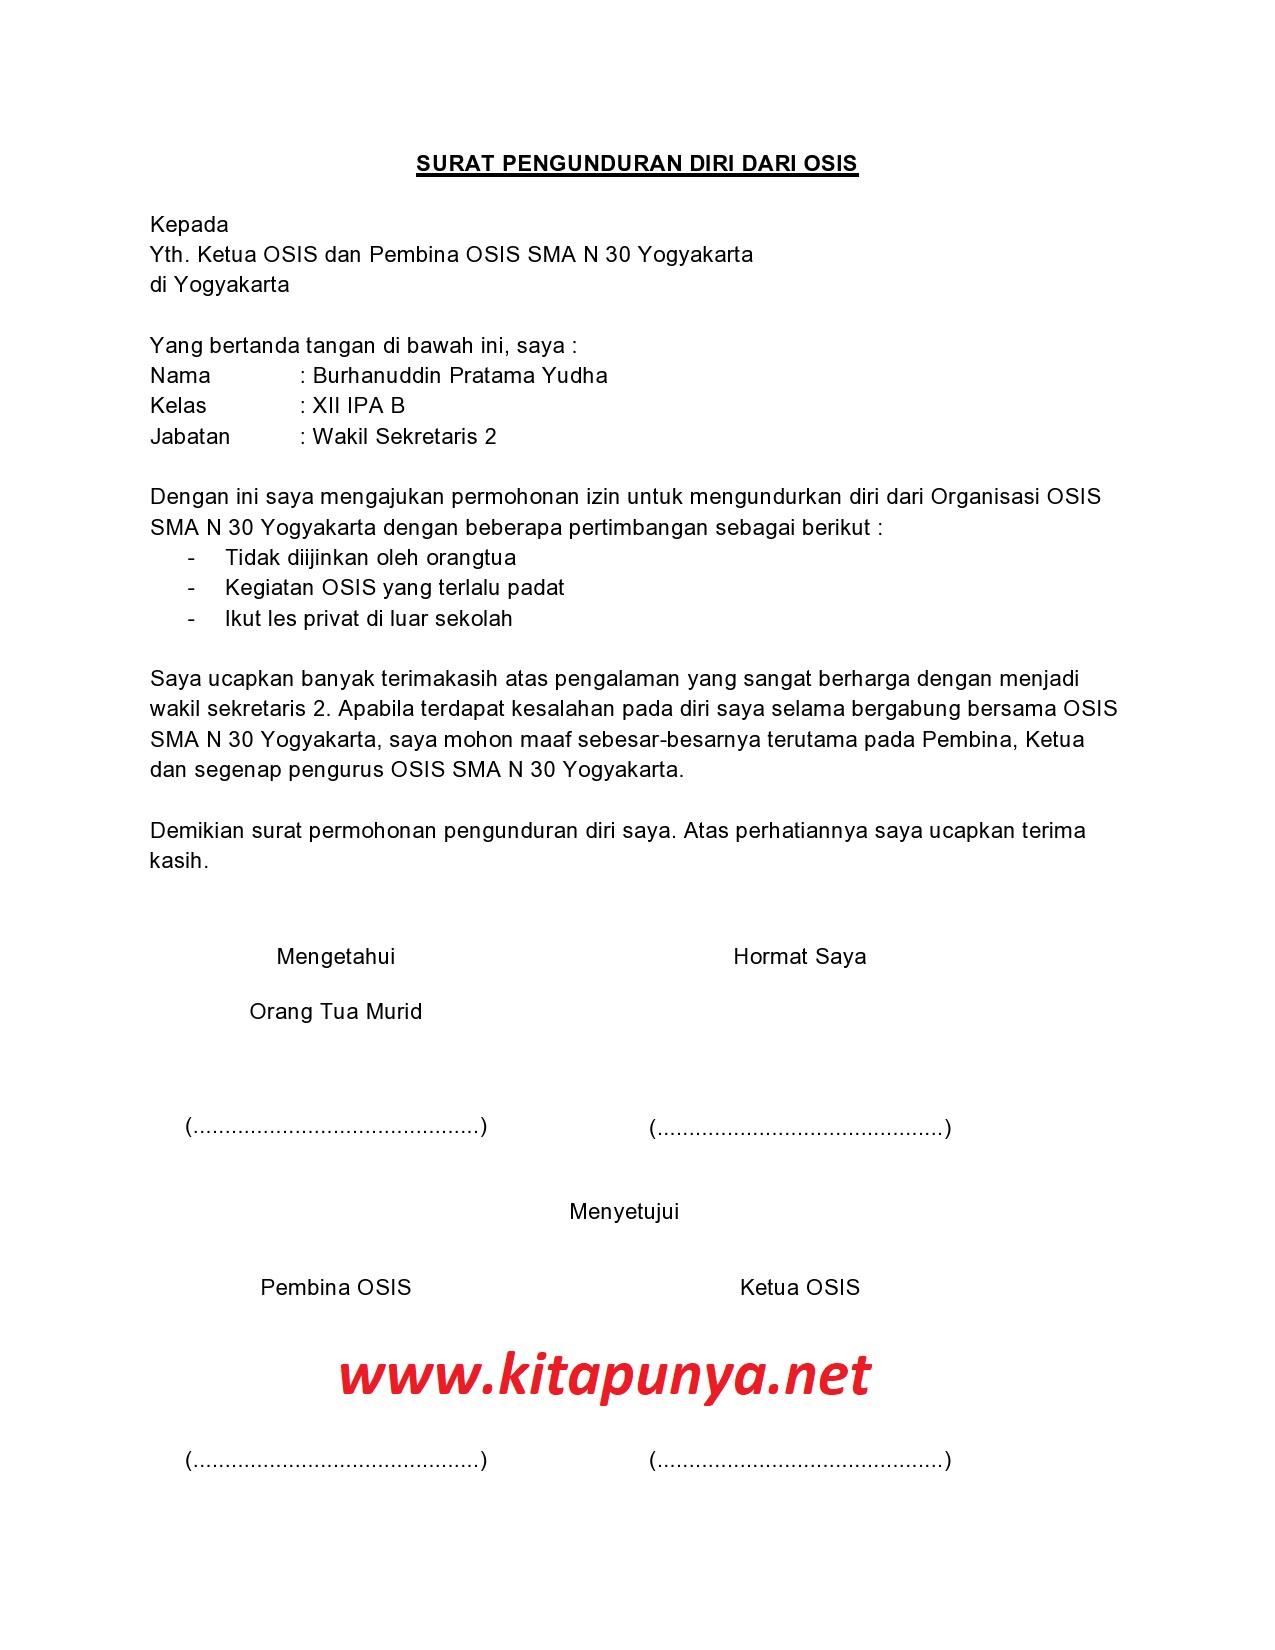 10++ Contoh surat pernyataan mengundurkan diri terbaru terbaru